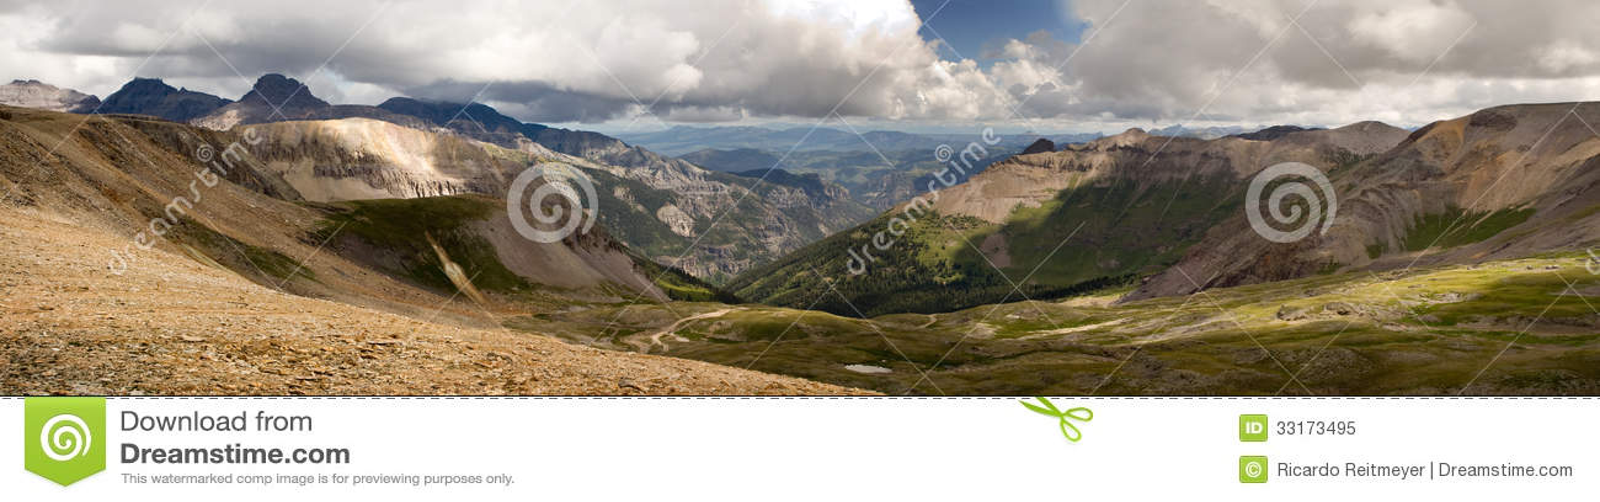 Imogene Pass Ouray Colorado Mountain Top Panoramic Royalty